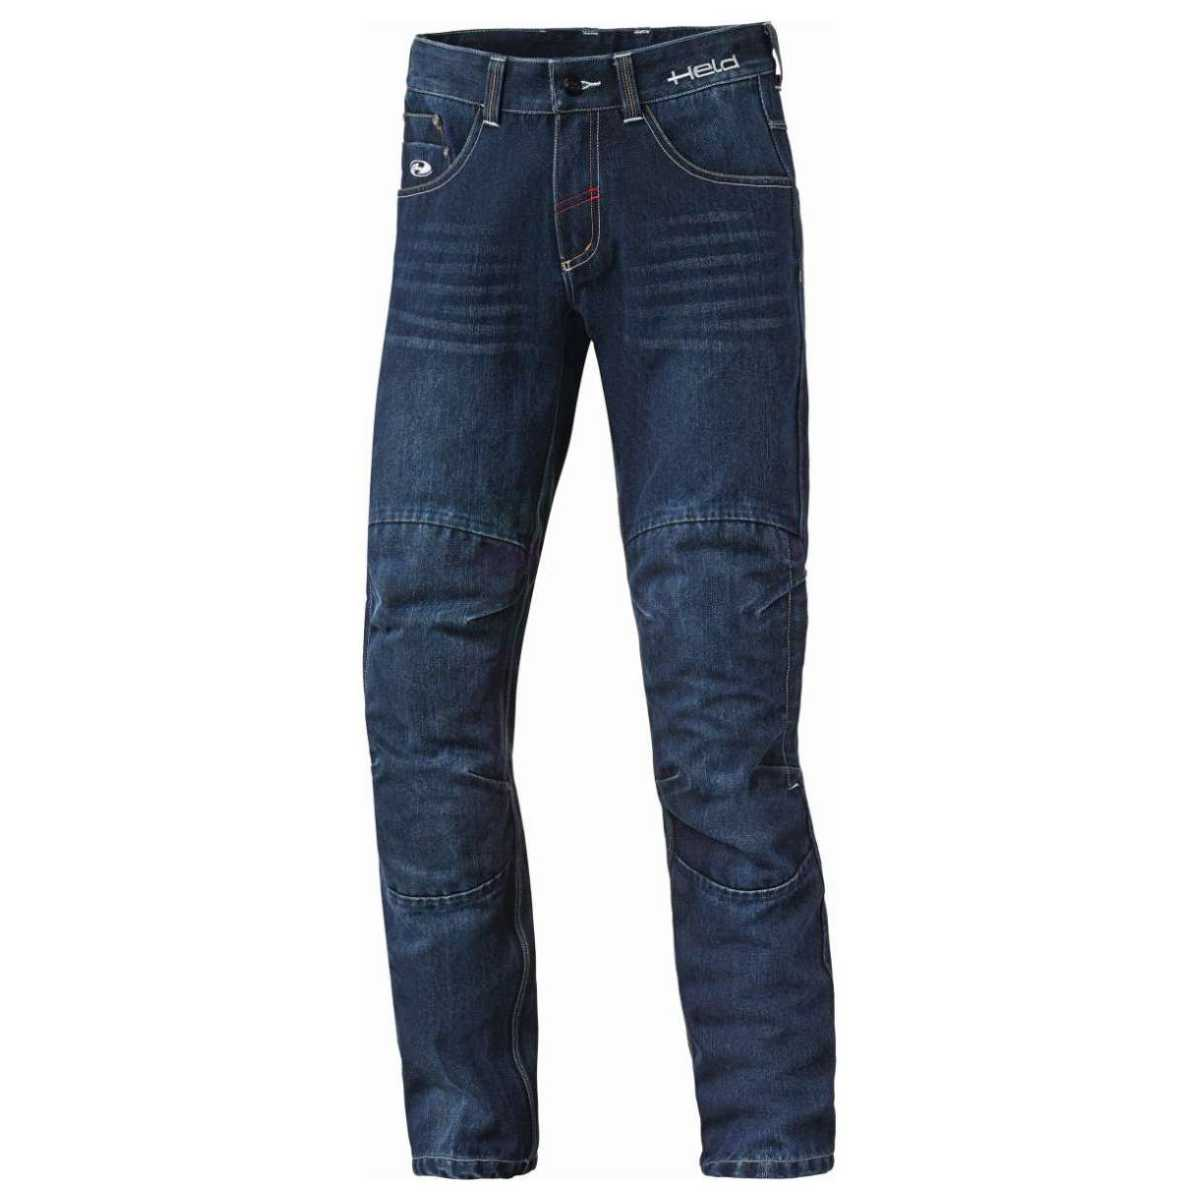 held barrier motorrad jeans wasserdicht blau cs bikewear. Black Bedroom Furniture Sets. Home Design Ideas